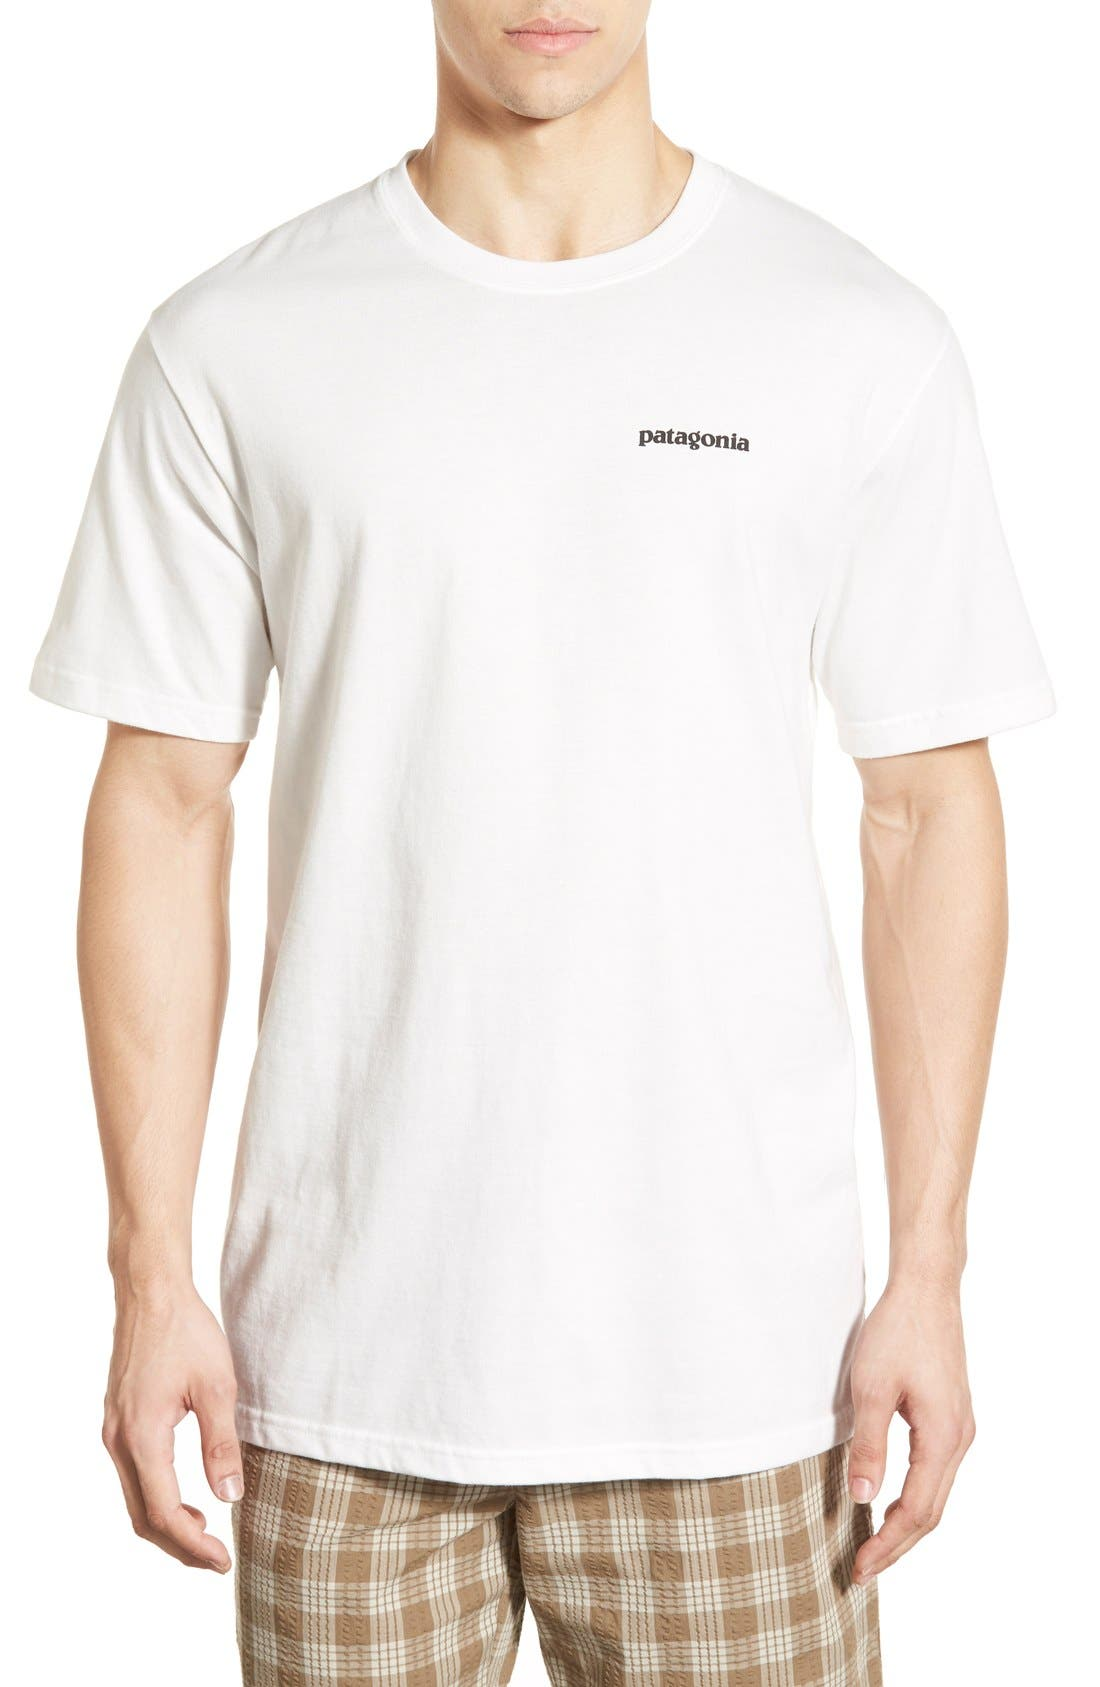 Patagonia 'Trout Fitz Roy' Organic Cotton T-Shirt